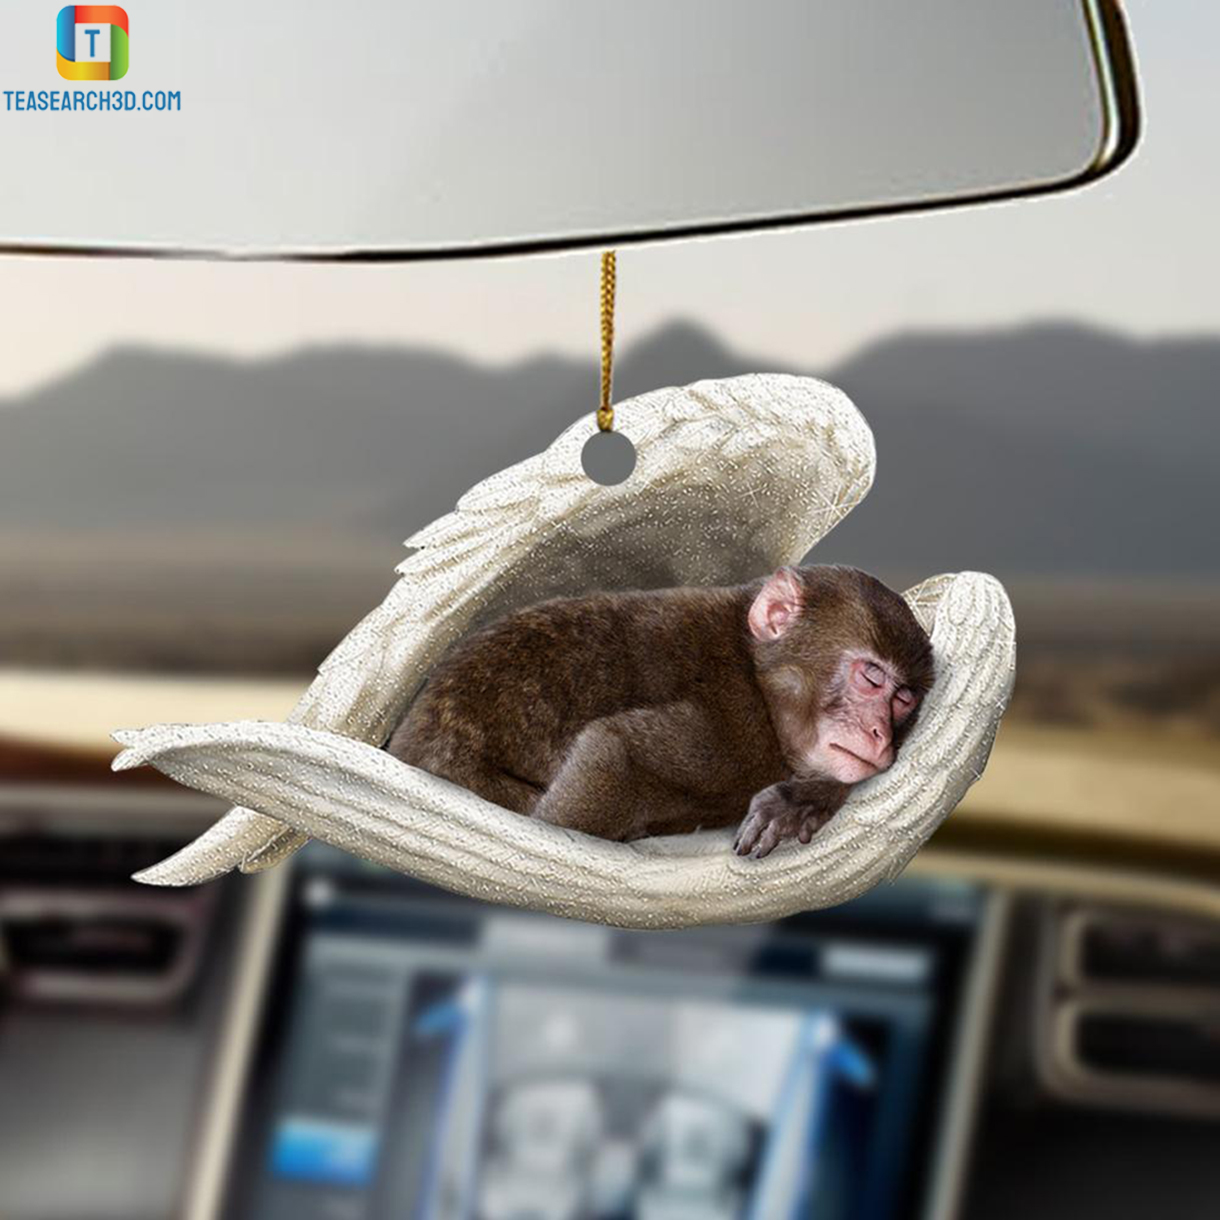 Monkey sleeping angel car hanging ornament 1